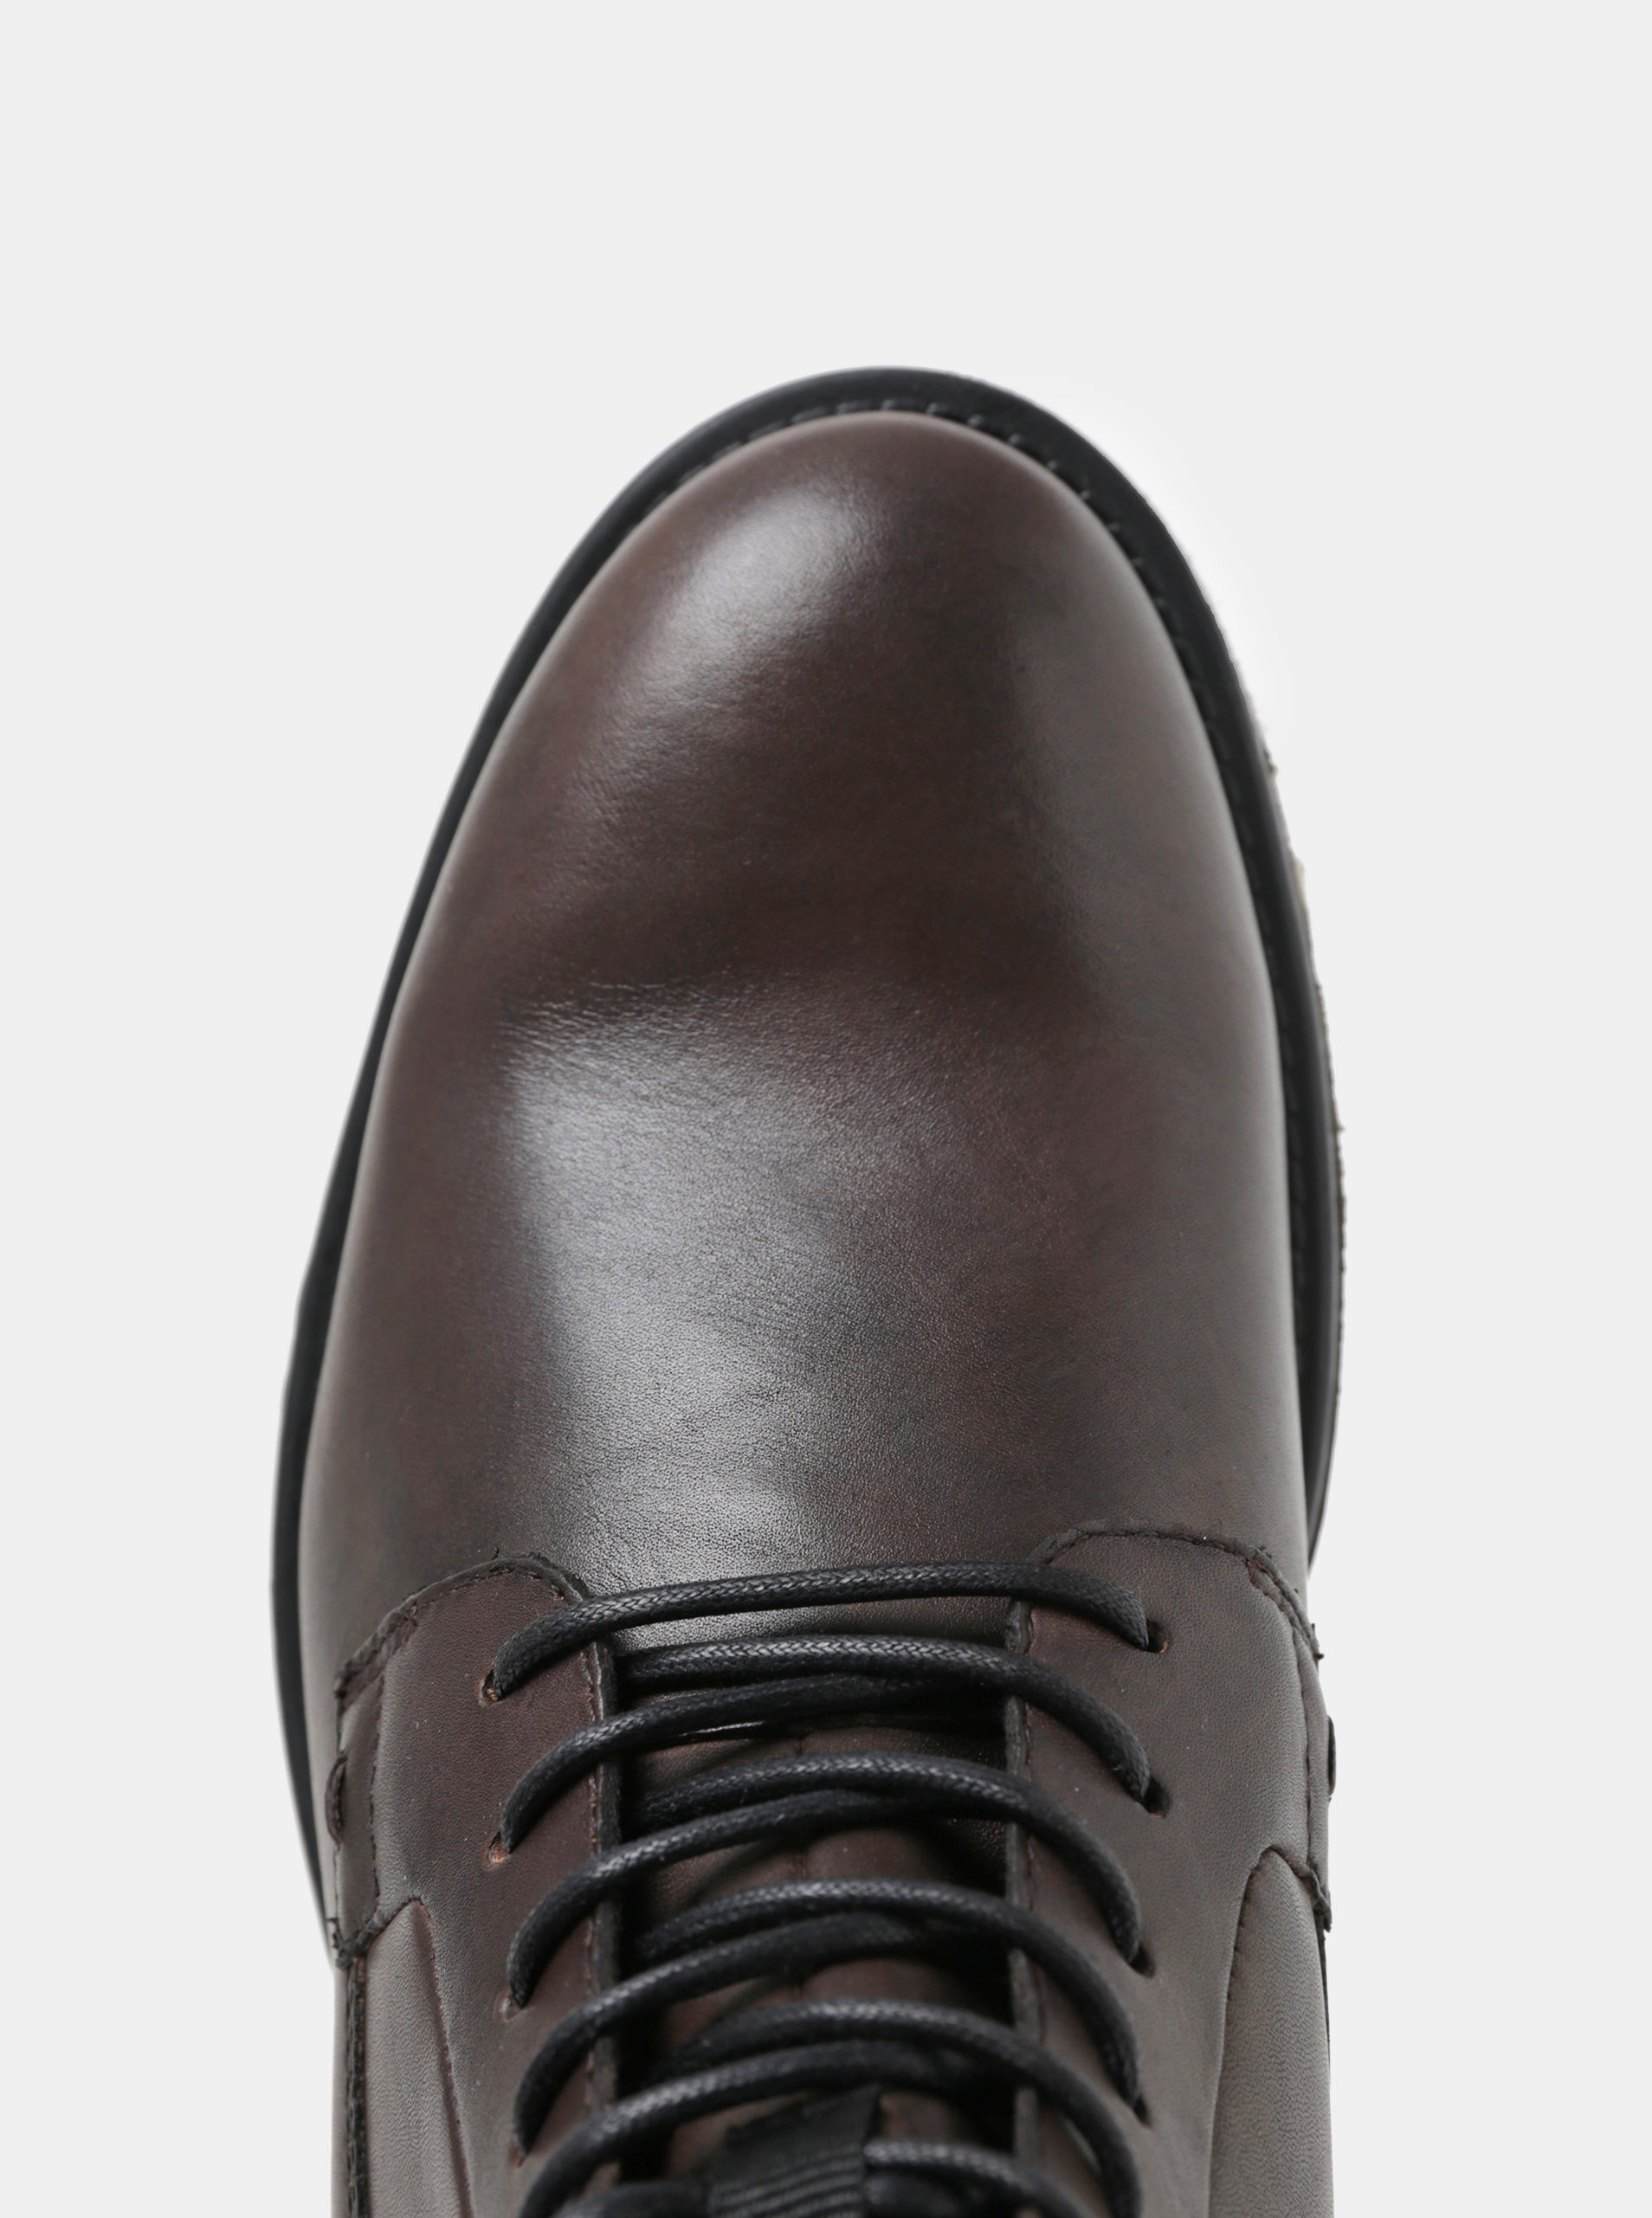 c6f3e571322 Tmavě hnědé dámské kožené kotníkové boty Vagabond Amina ...